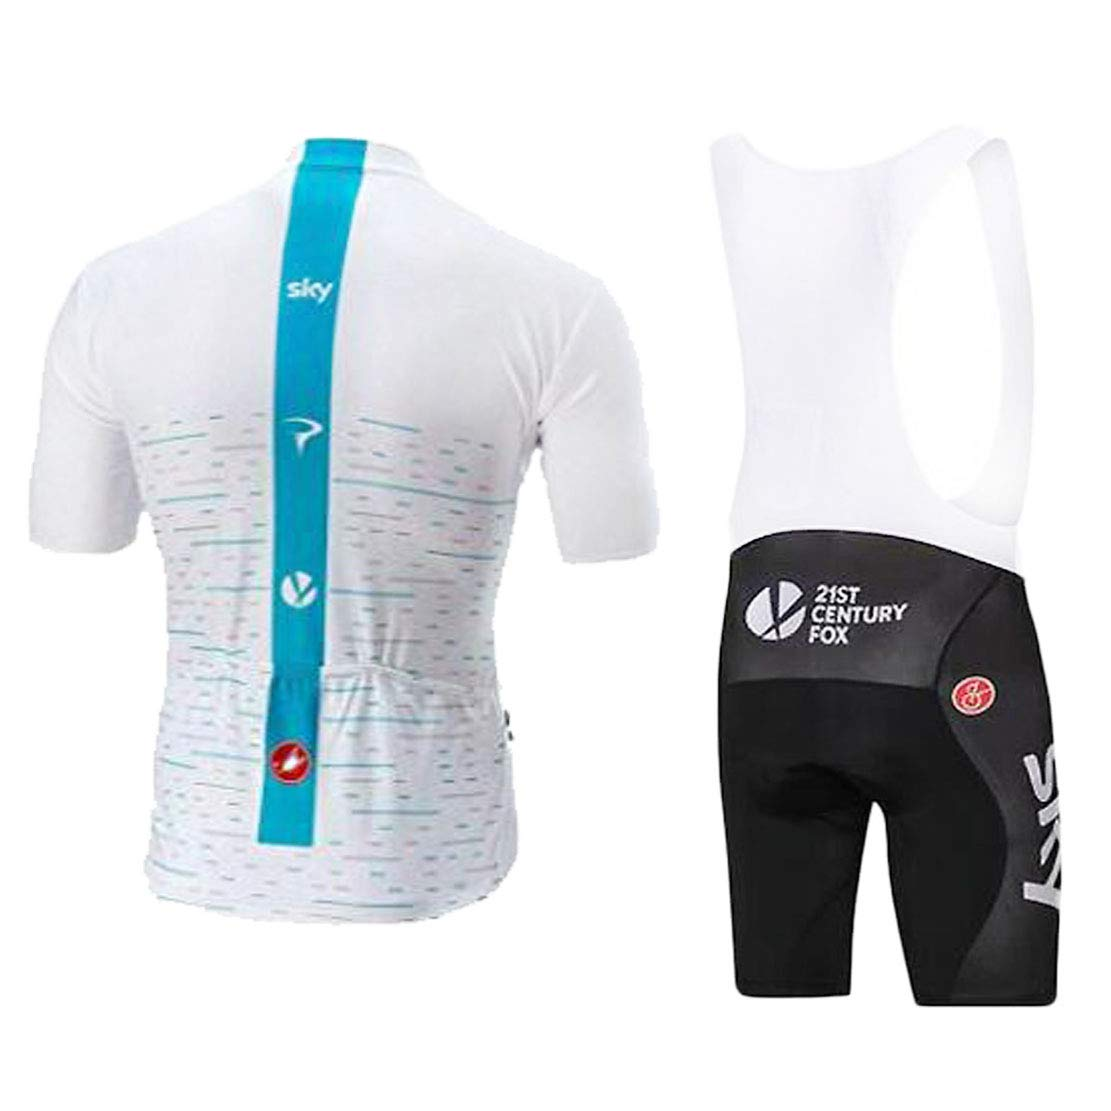 Men/'s Cycling Jerseys Bicycle Short Sleeve Shirt Cycling Clothing Bike Top YJ10